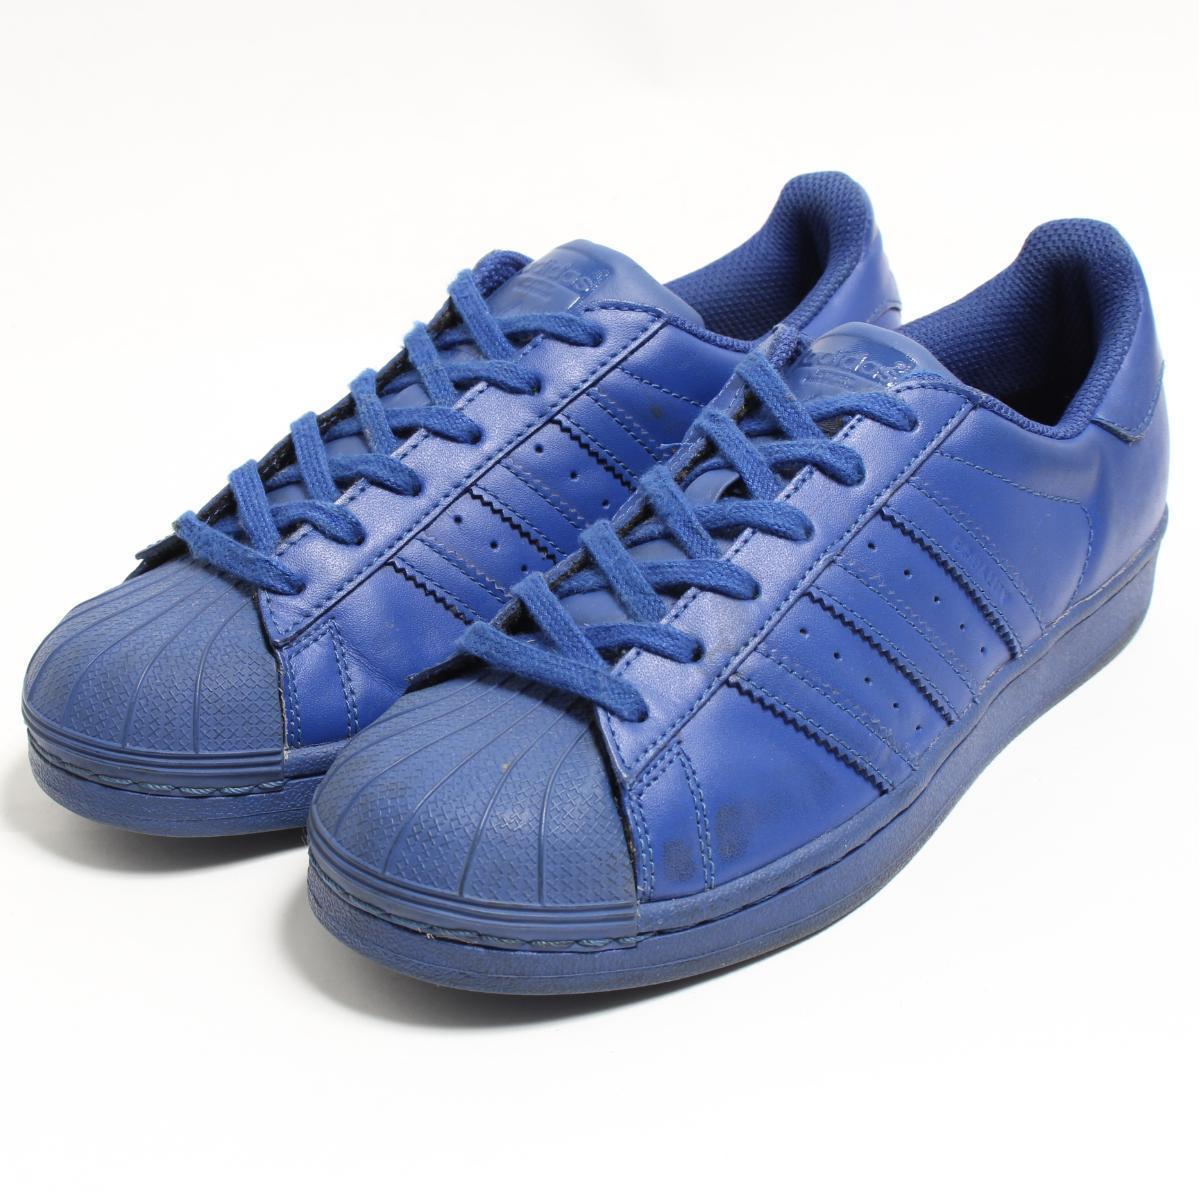 Lady's Pharrell 23 5cm Sneakers Superstar Williams Adidas Bon4932 Us5 U4fwPxnq